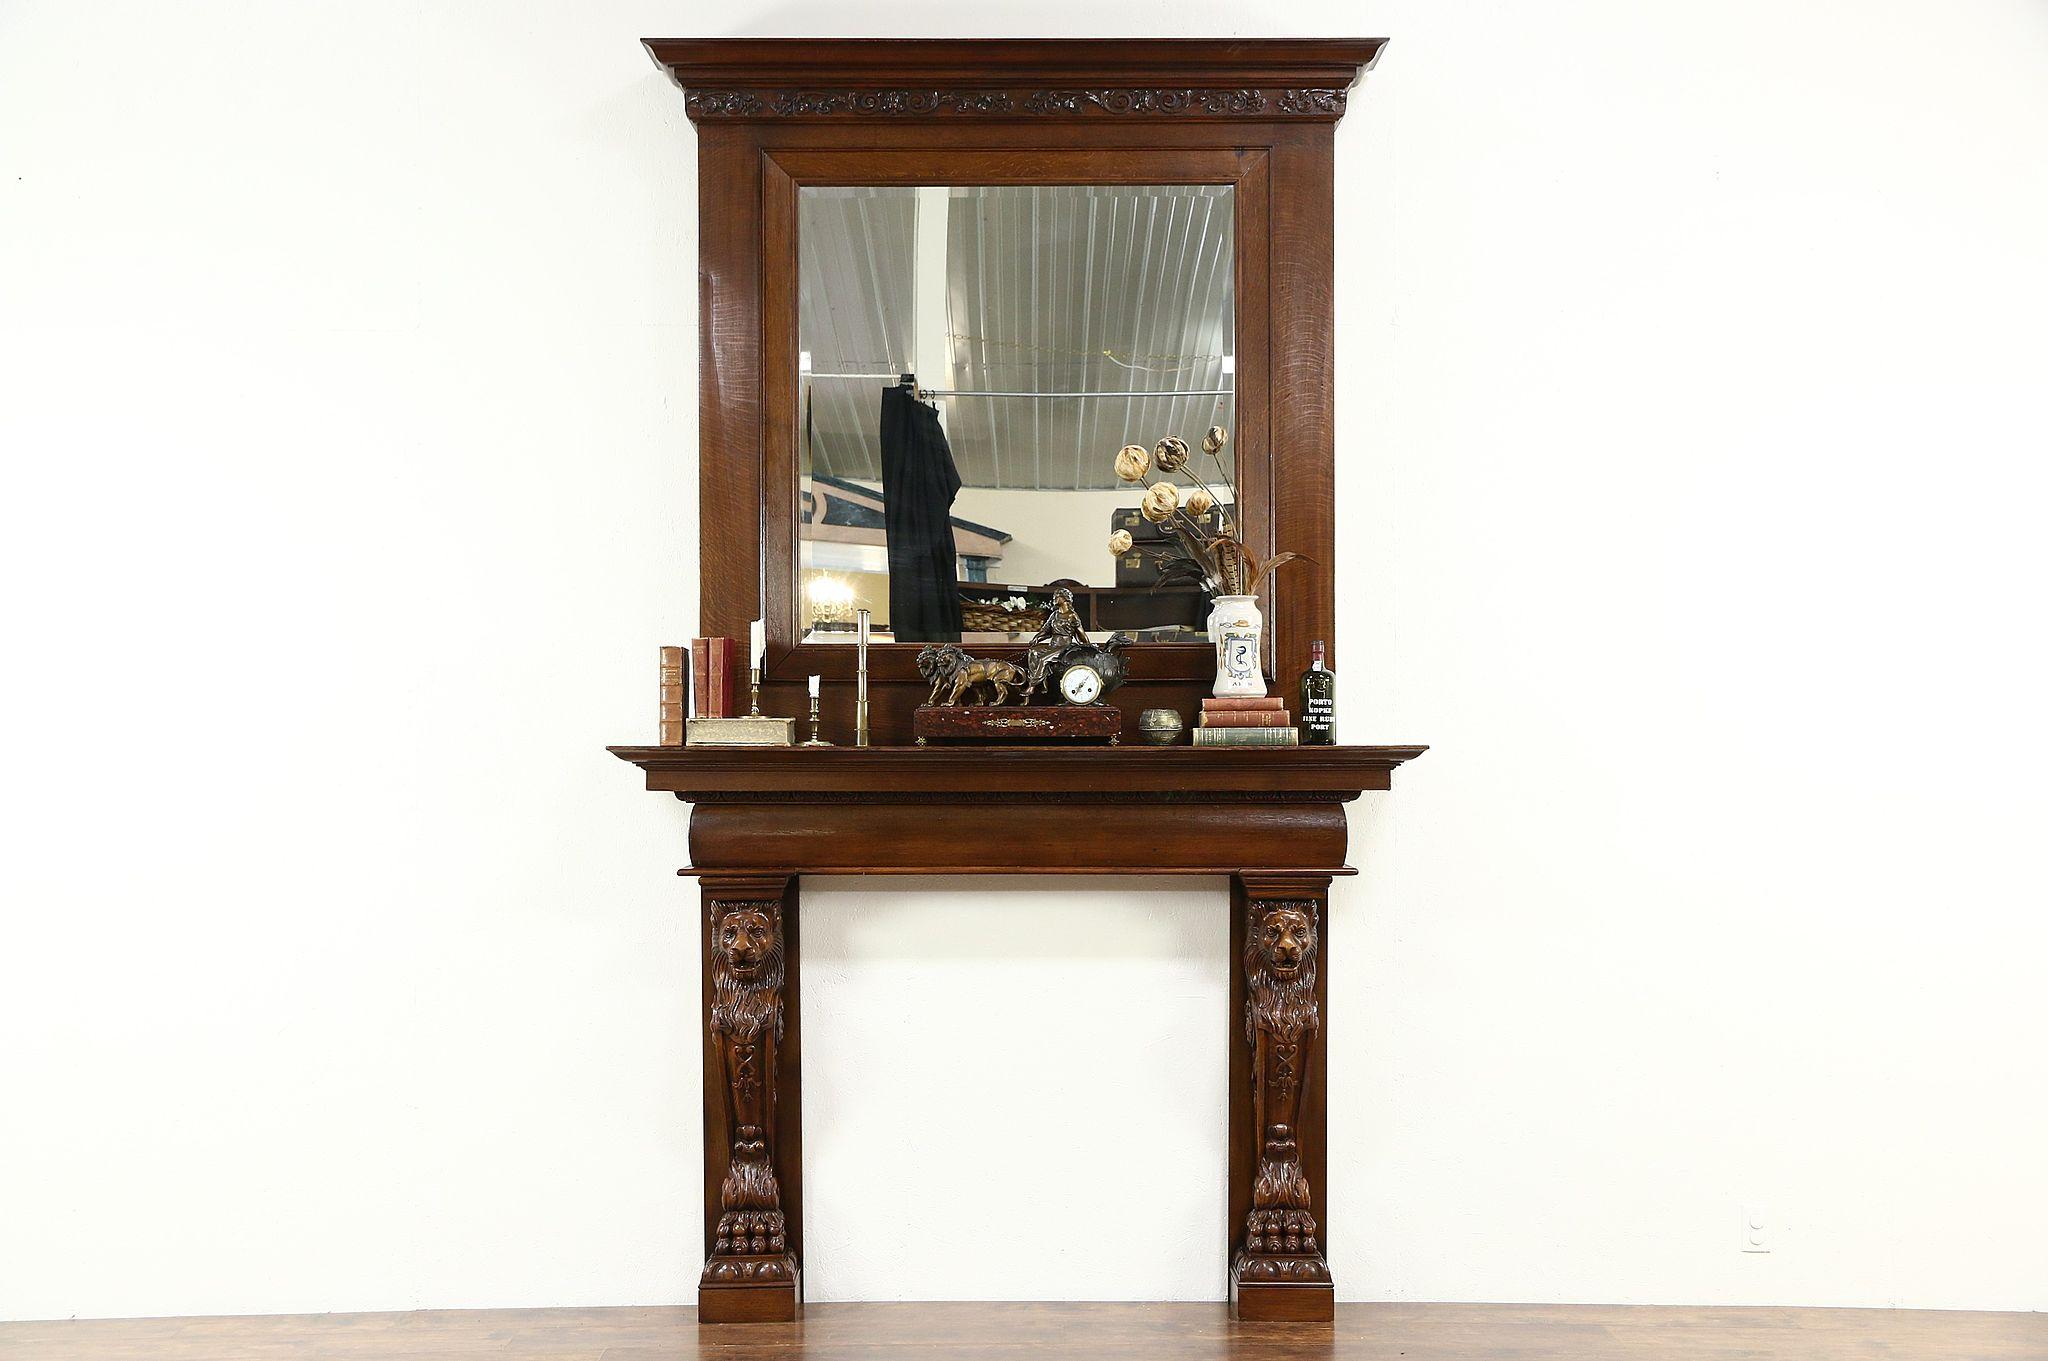 oak antique architectural salvage 10 u0027 fireplace mantel mirror